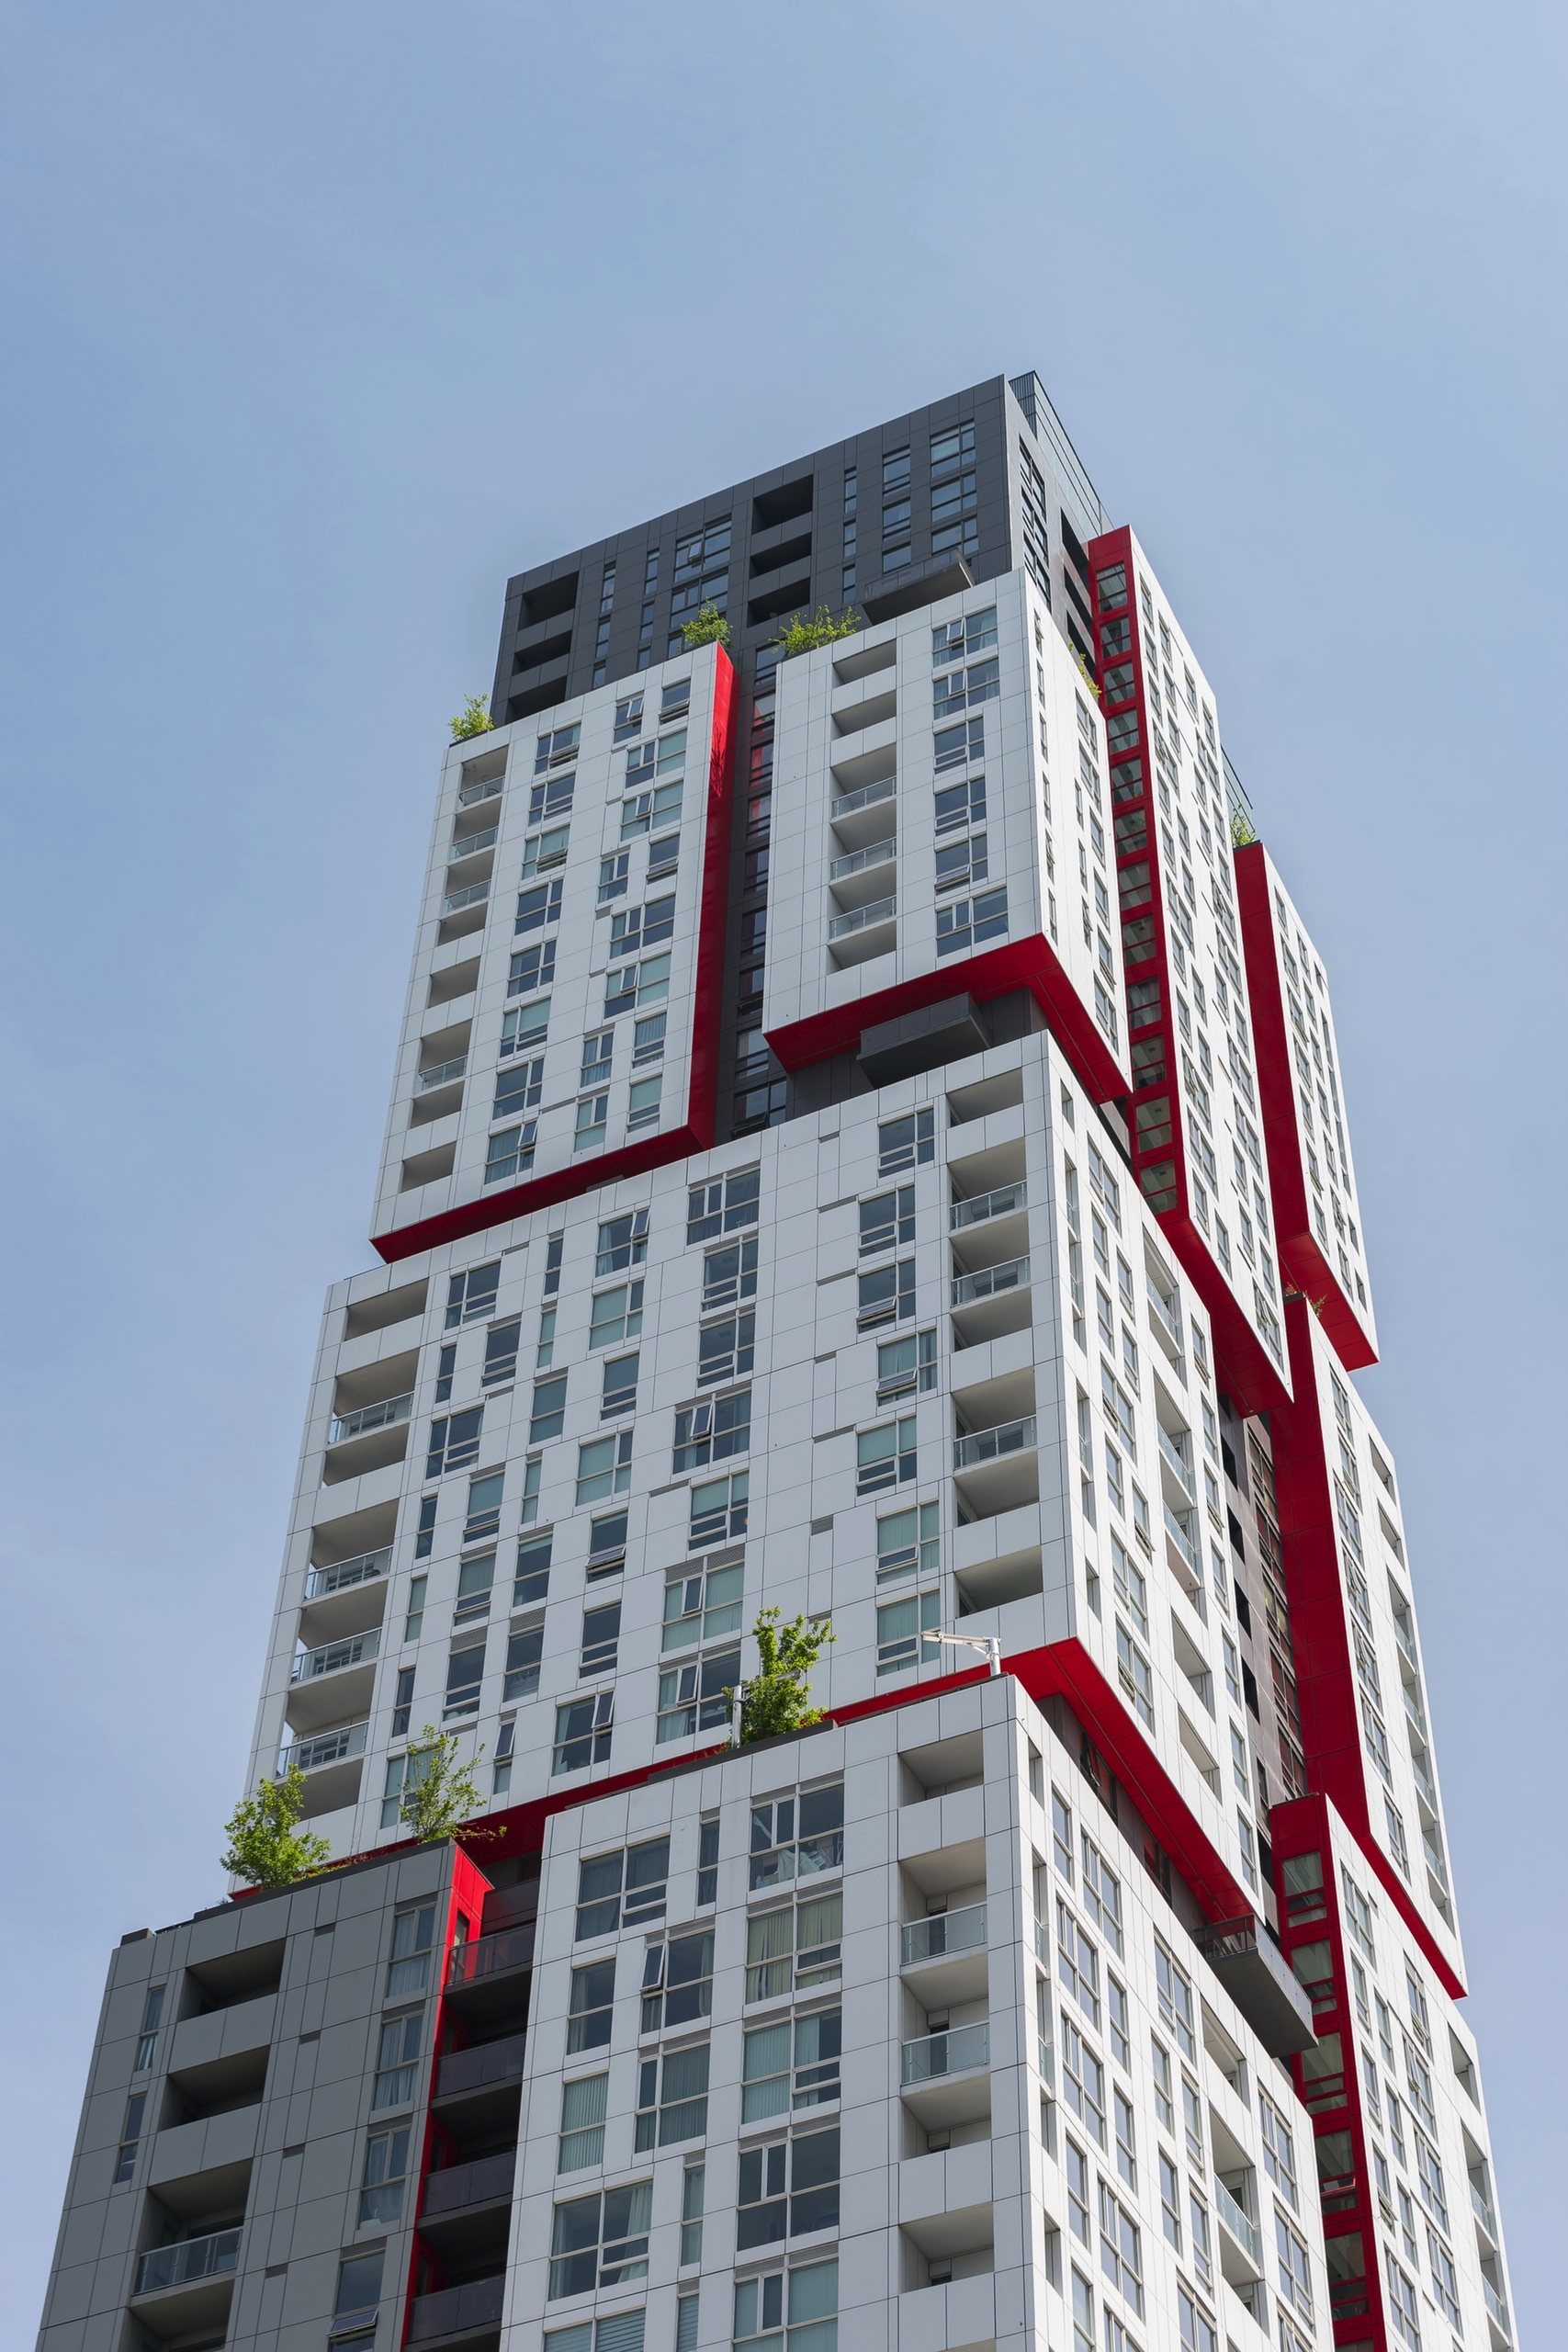 total obsession architecture, b - scottwebb | ello